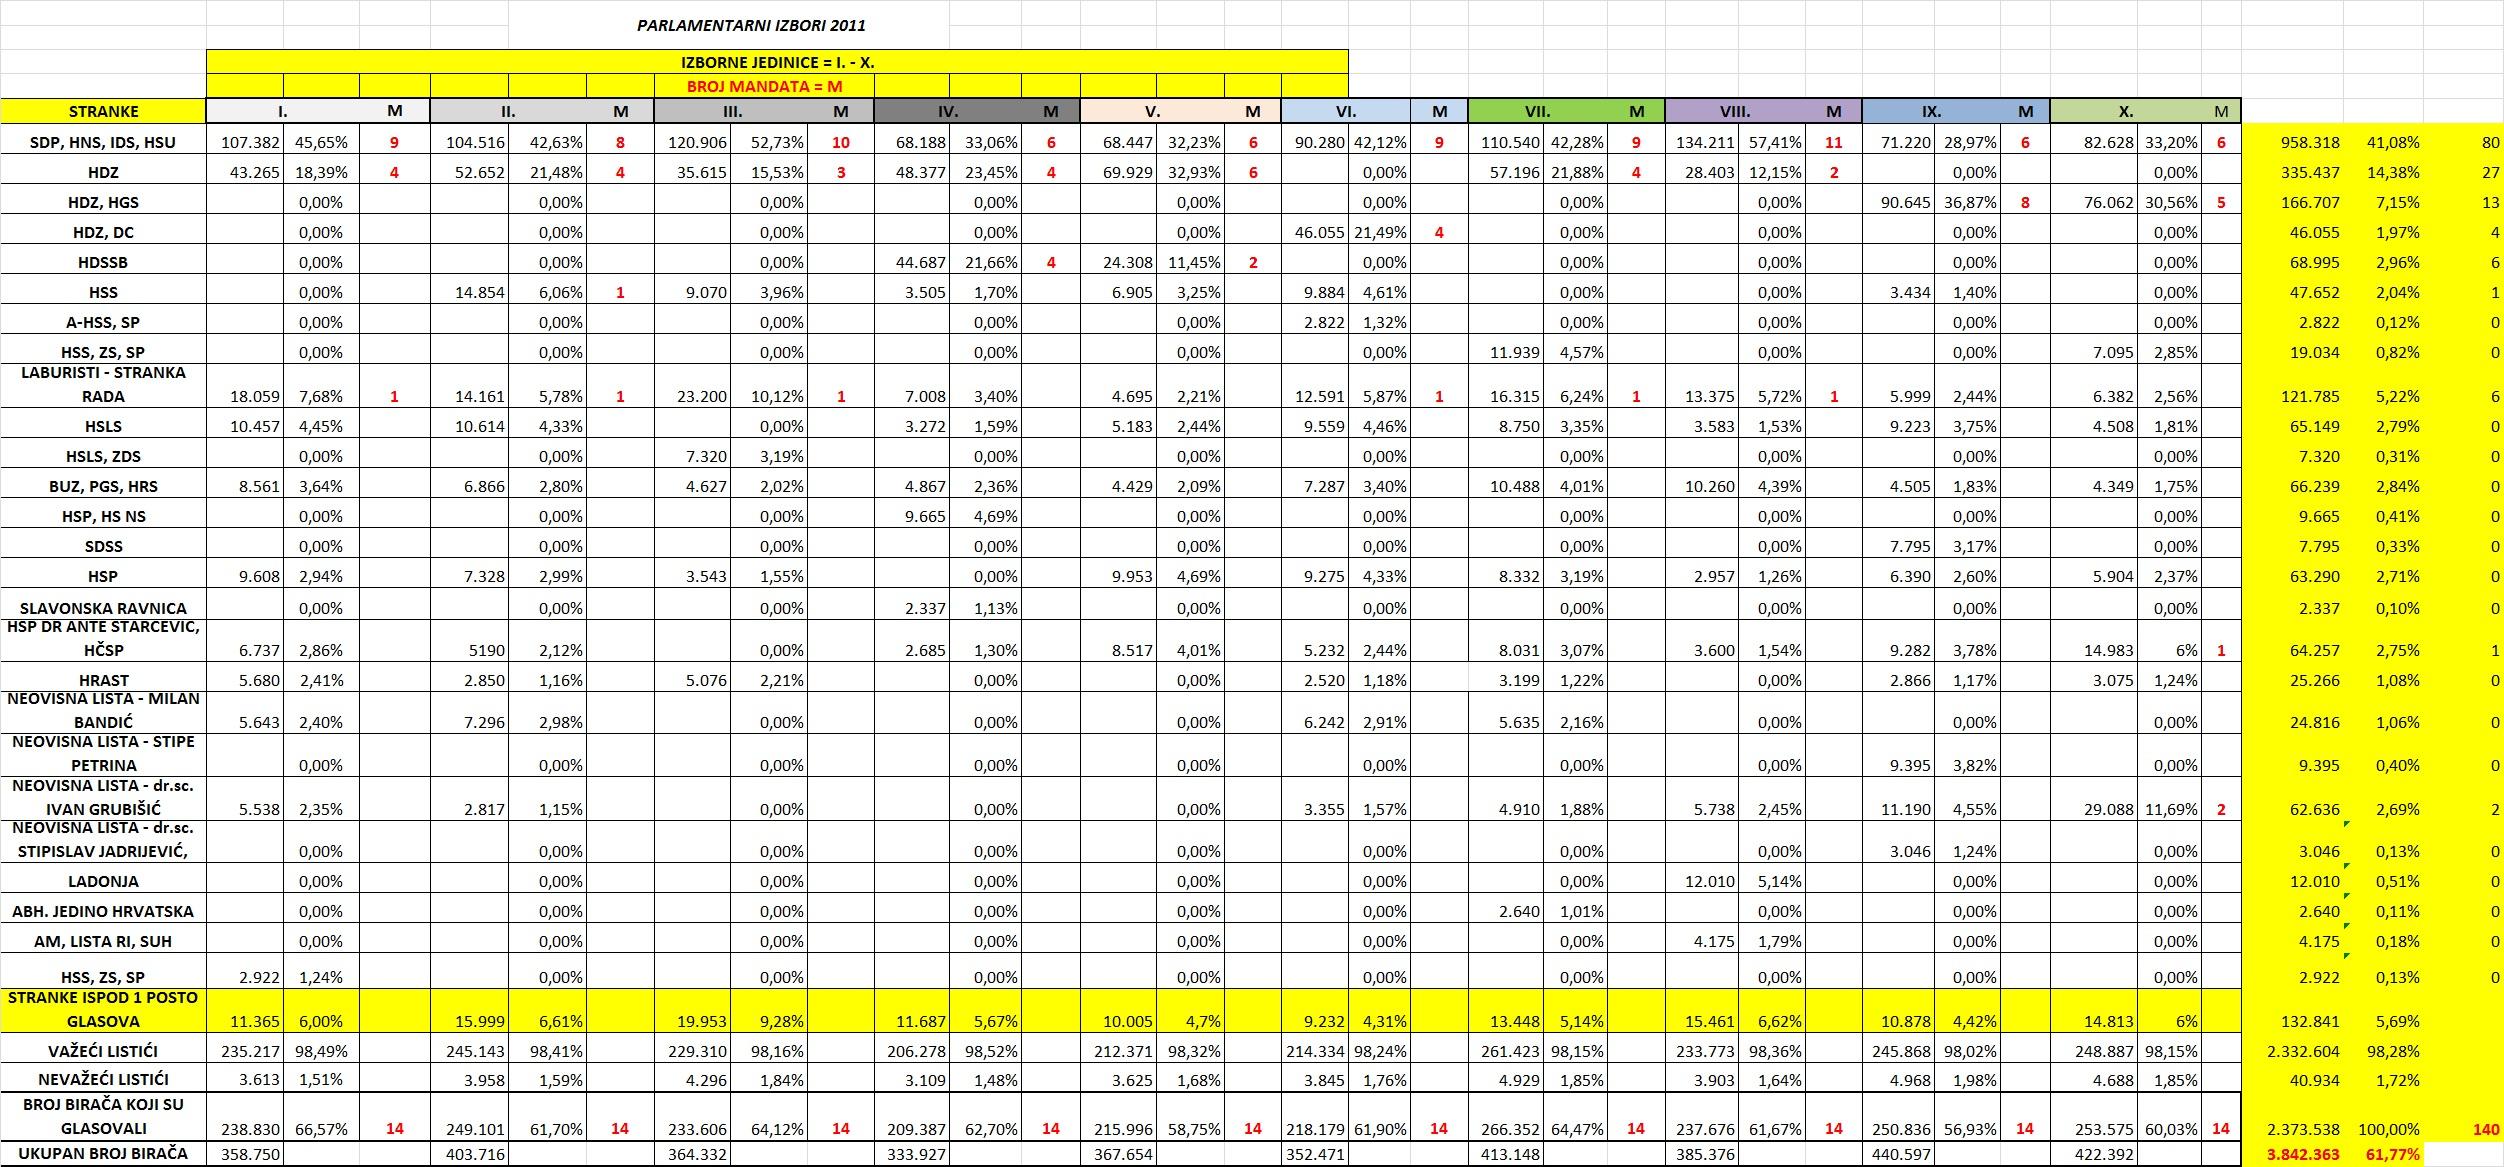 Rezultati parlamentarnih izbora 2011.